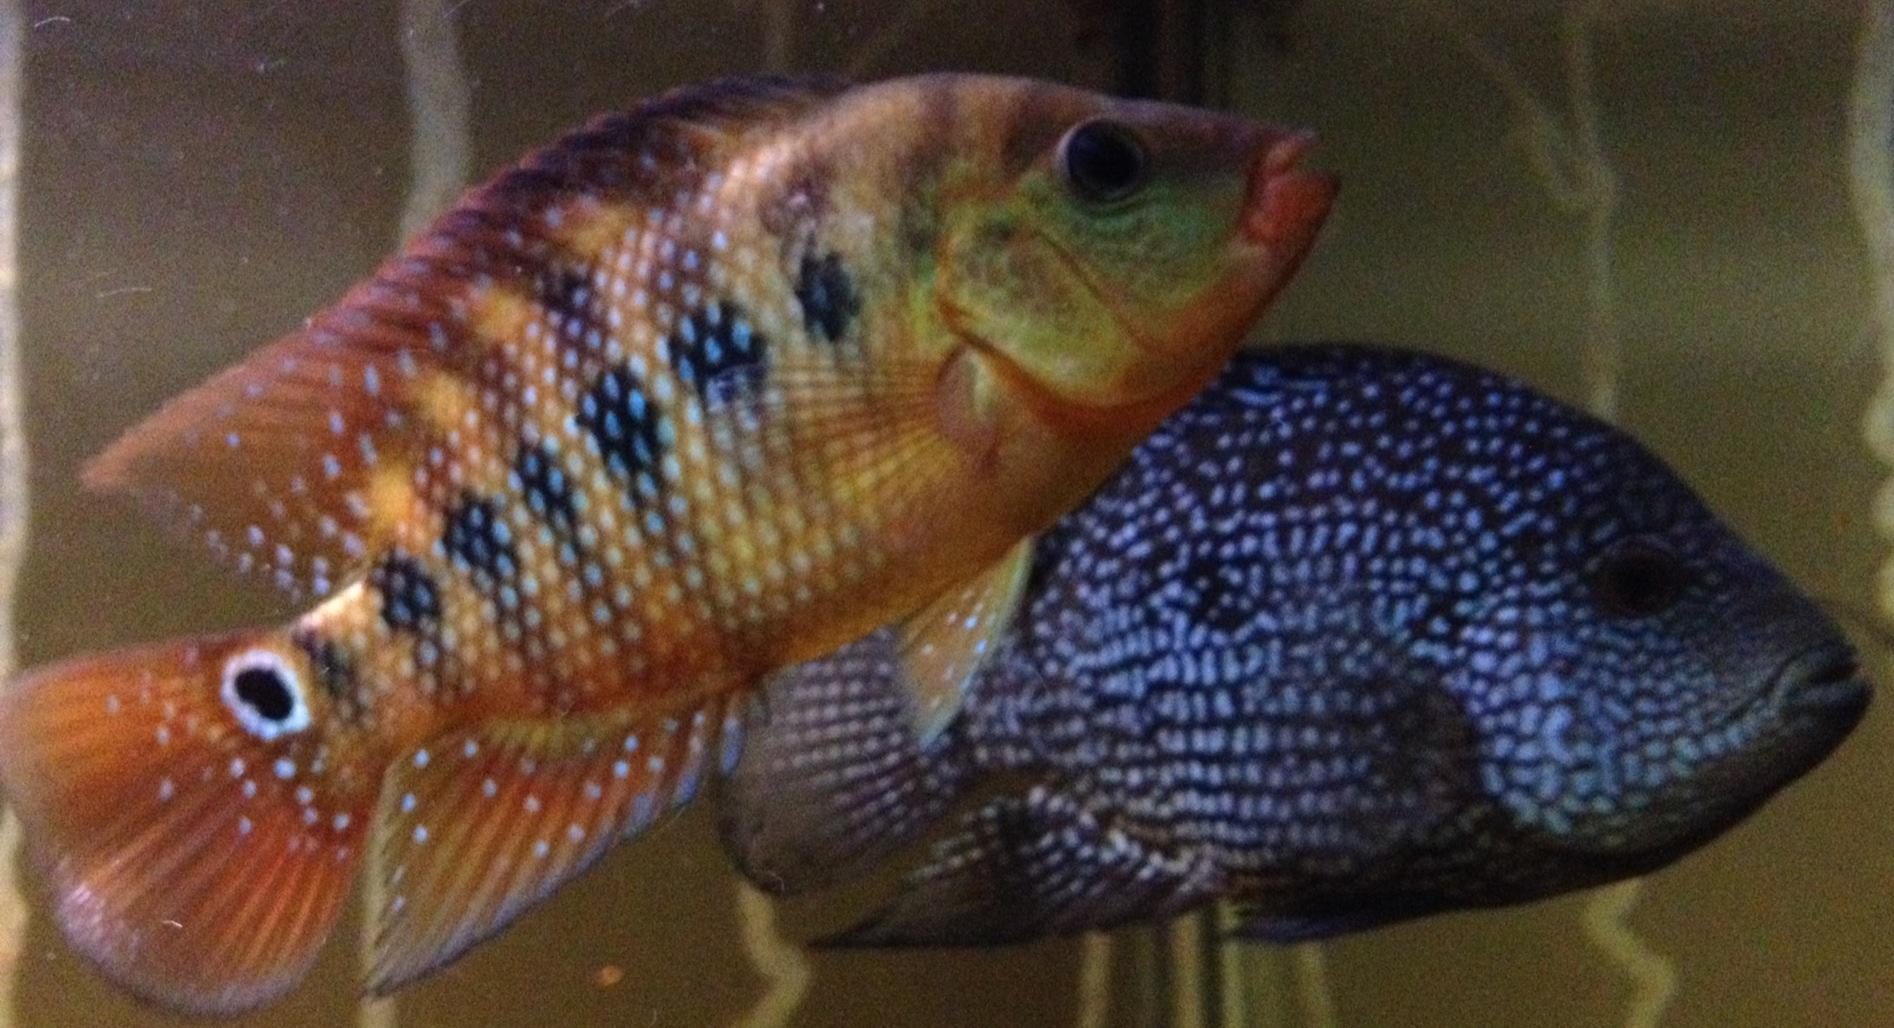 Red terror fish